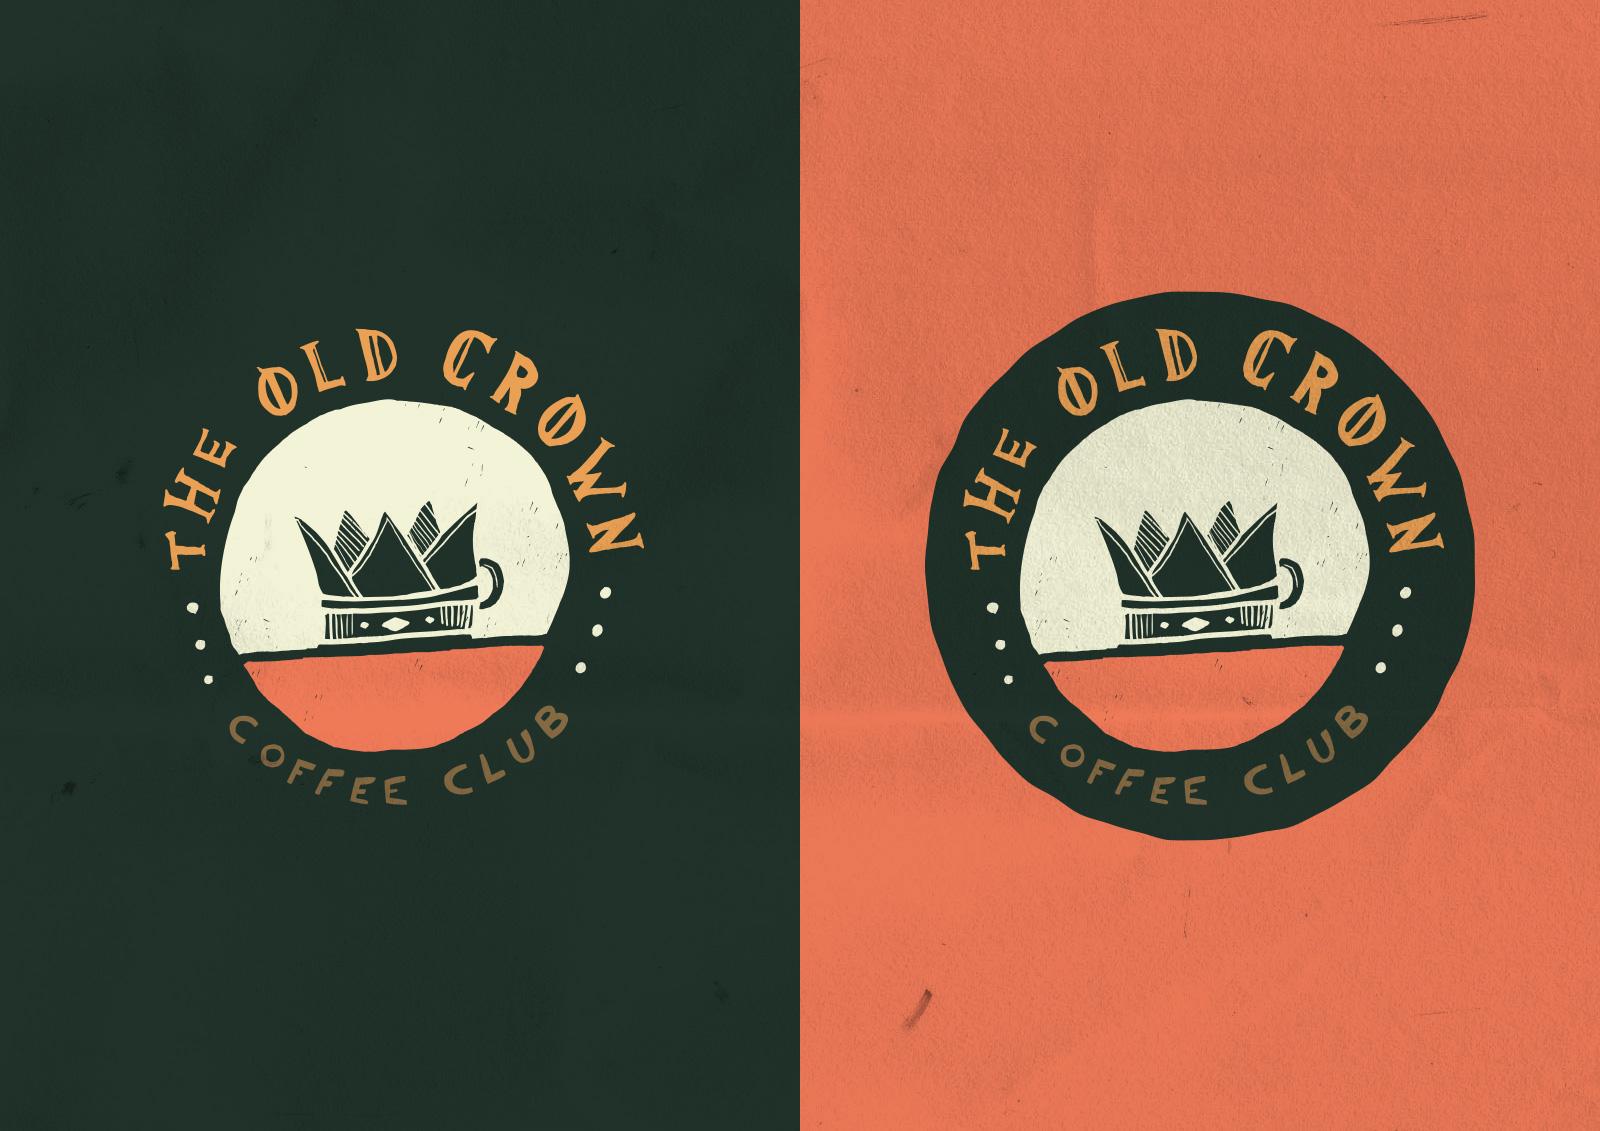 the-old-crown-coffee-club_logo_2